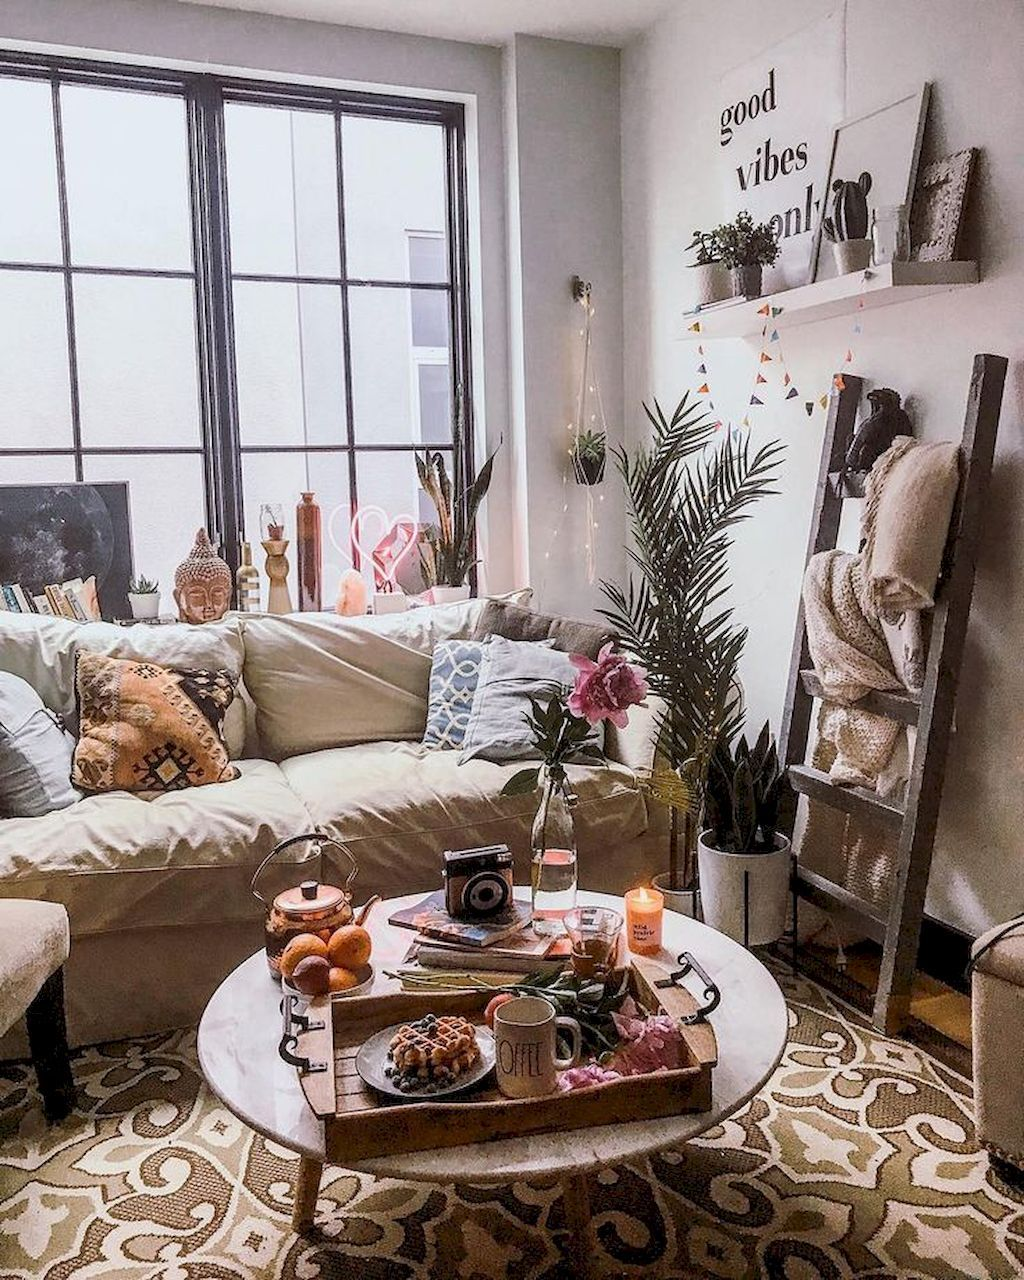 65 Modern Bohemian Living Room Decor Ideas #apartmentlivingrooms